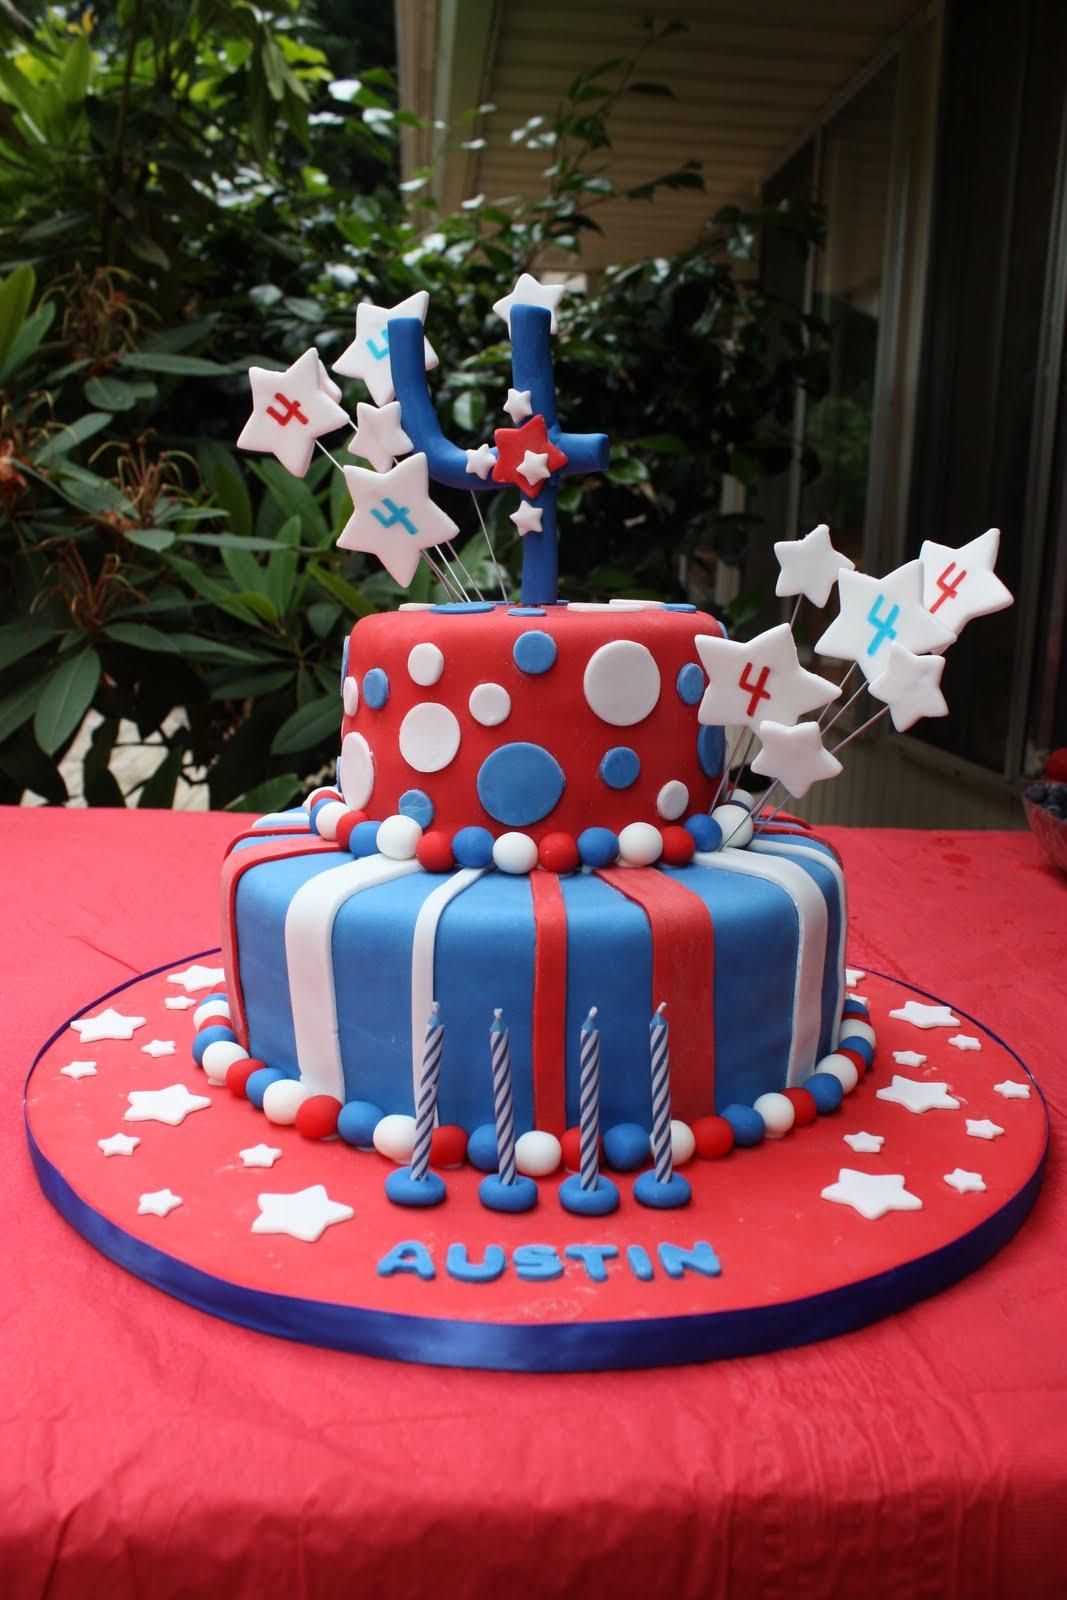 Whimsical By Design Austins Superhero Birthday Party